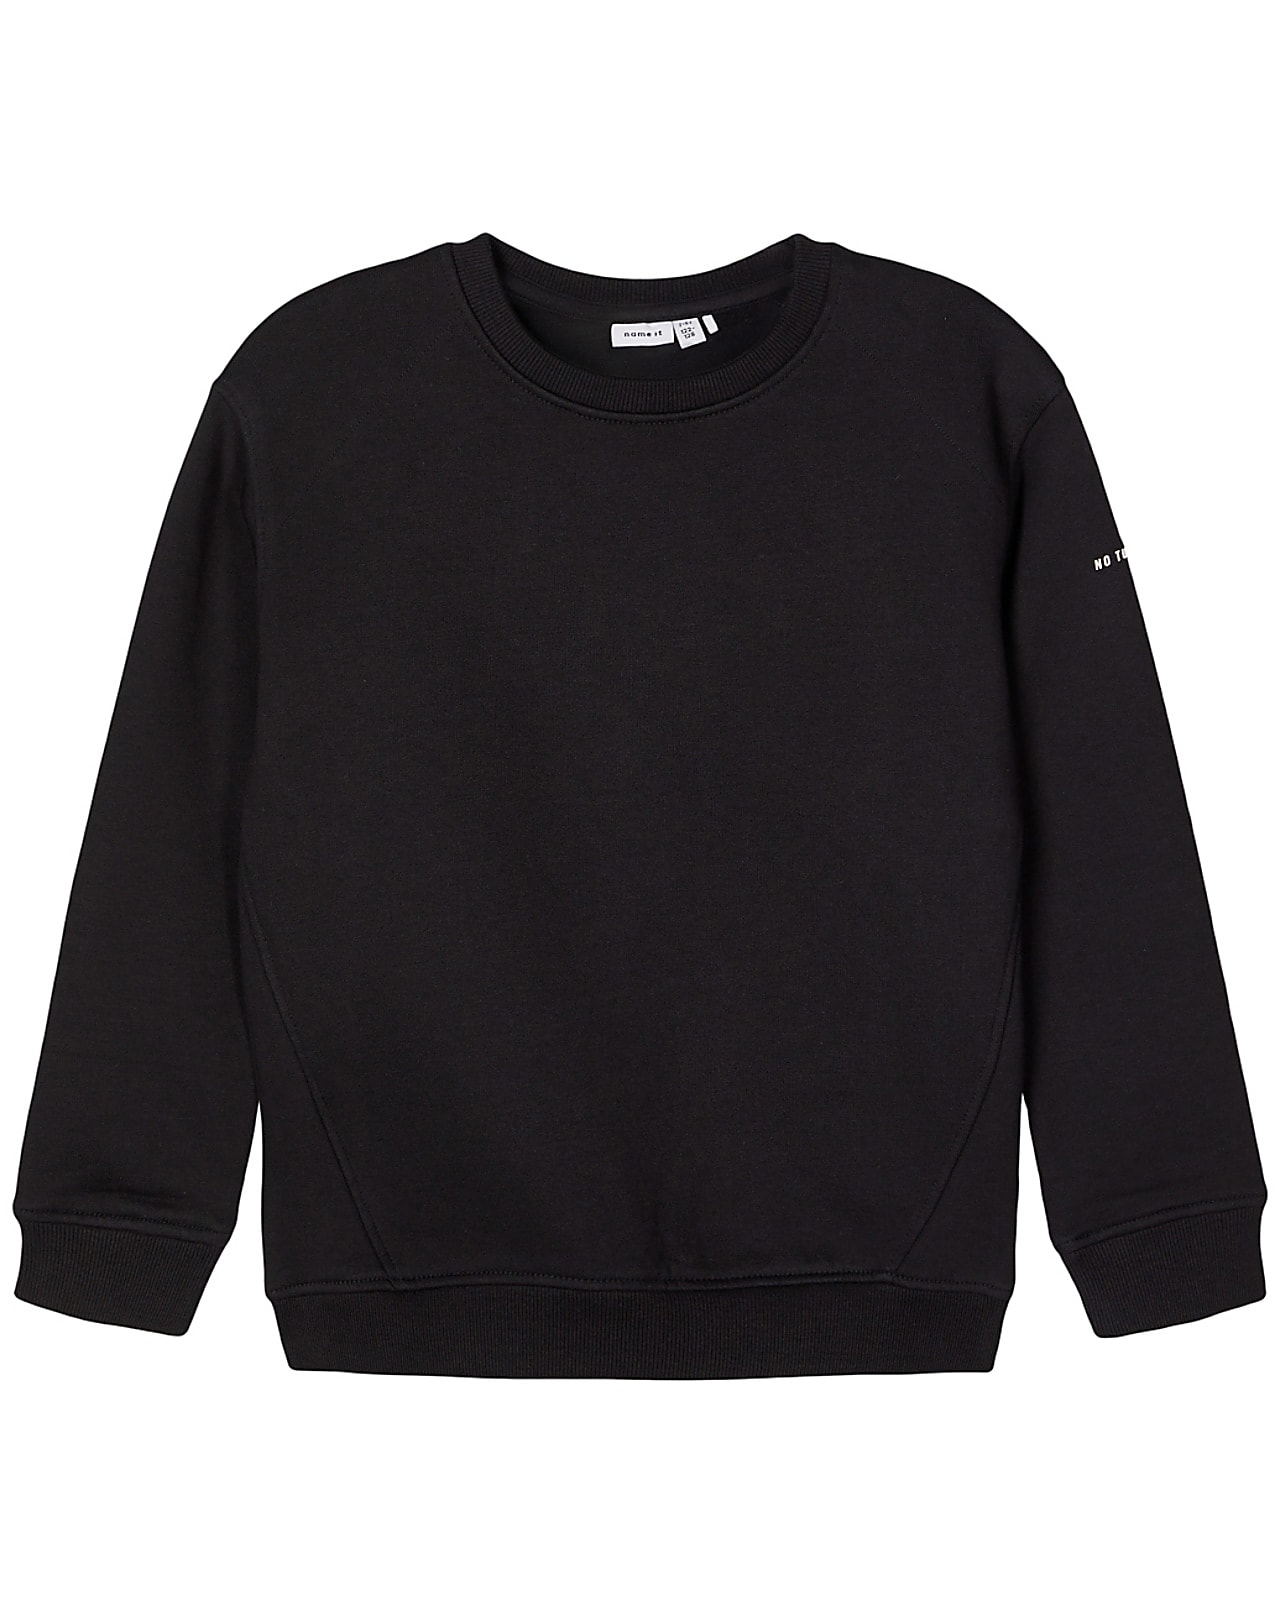 Name It sweatshirt, Osgas, black